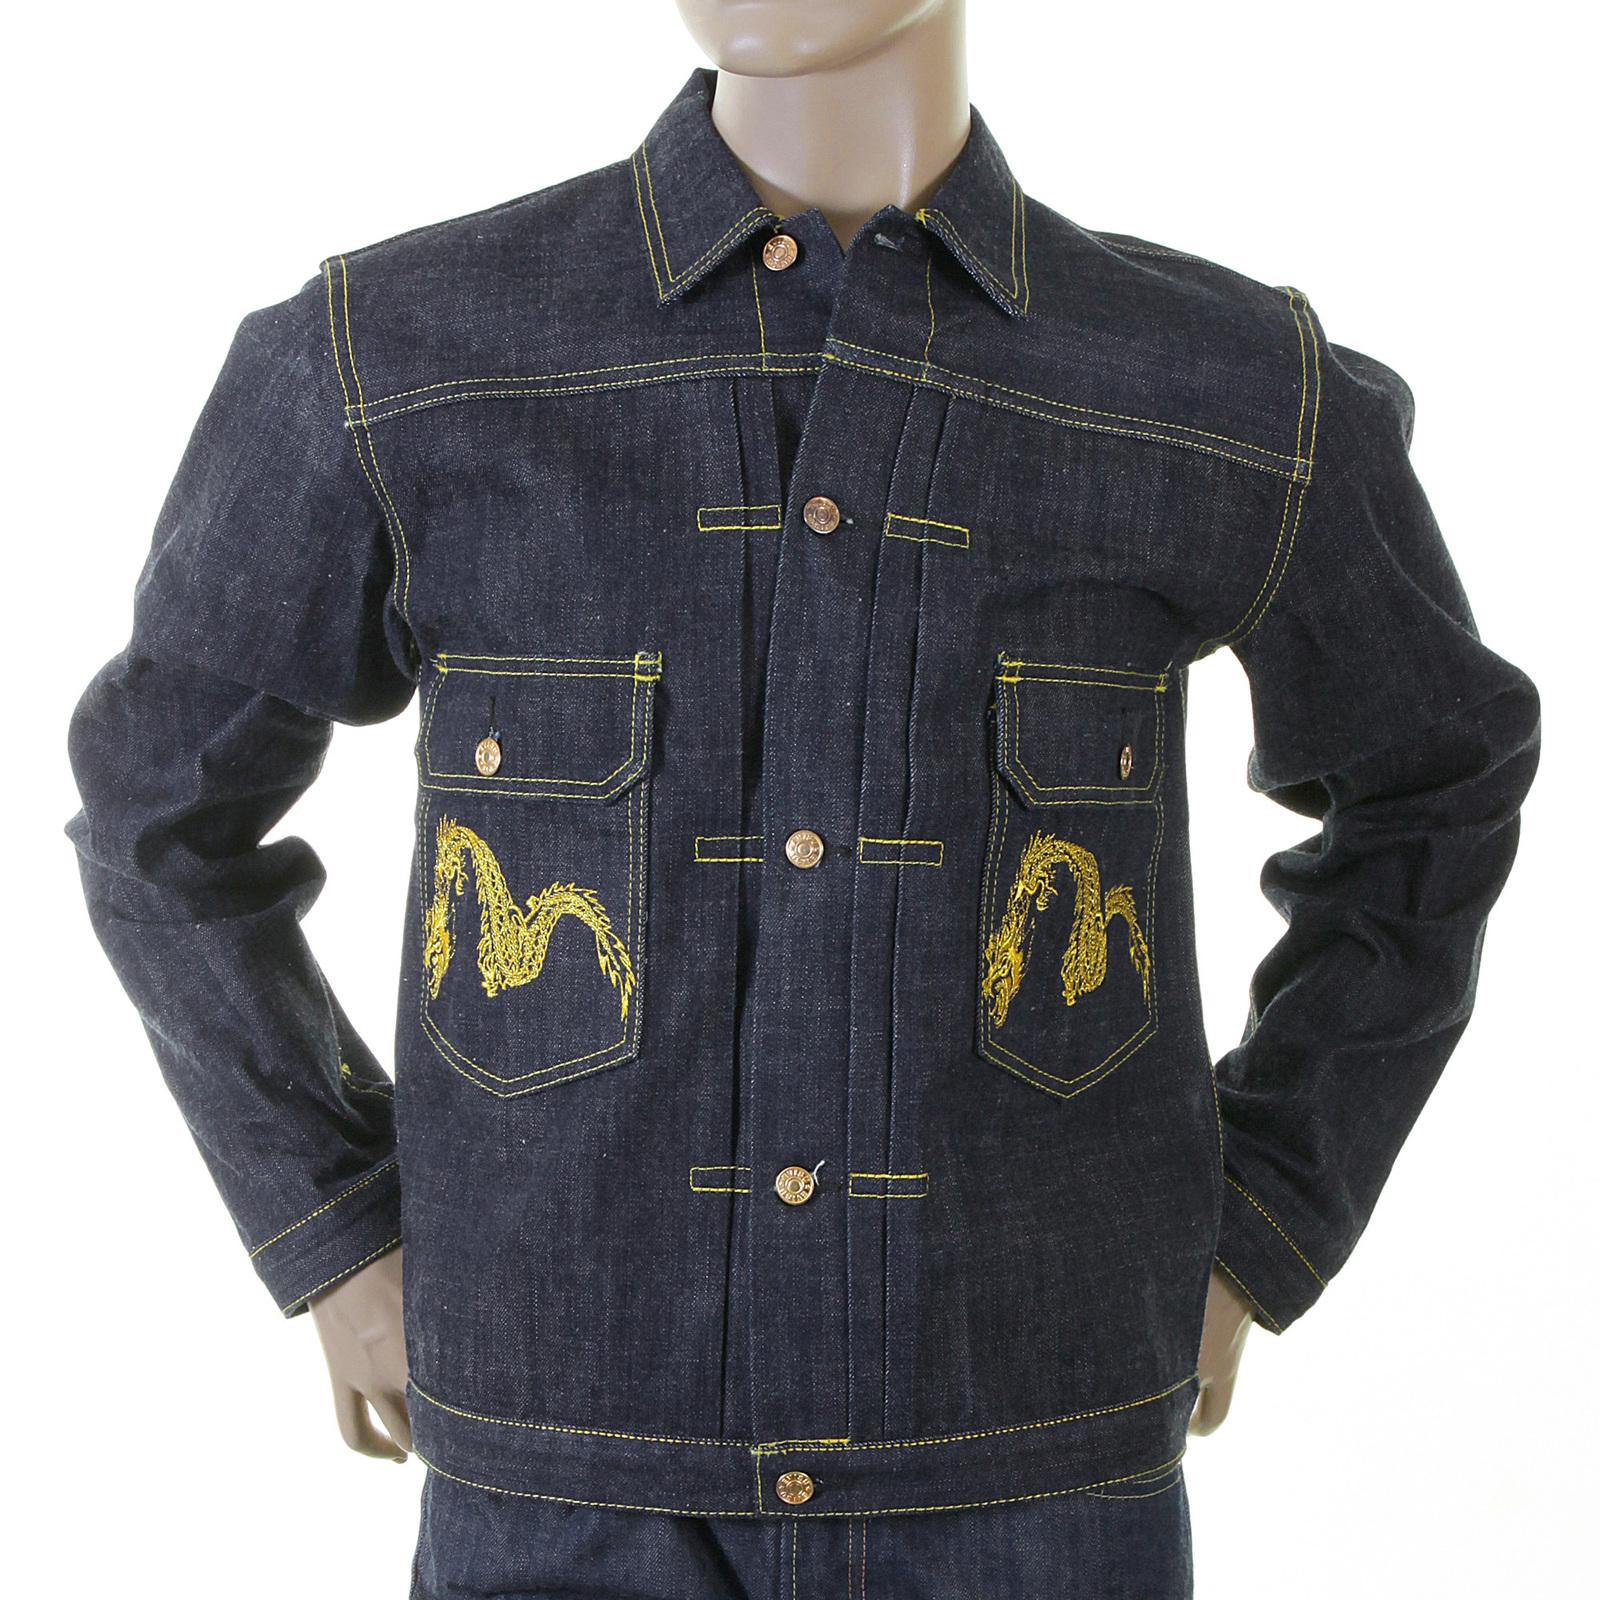 Shop for the Non Wash Mens Indigo Denim Jacket by Evisu